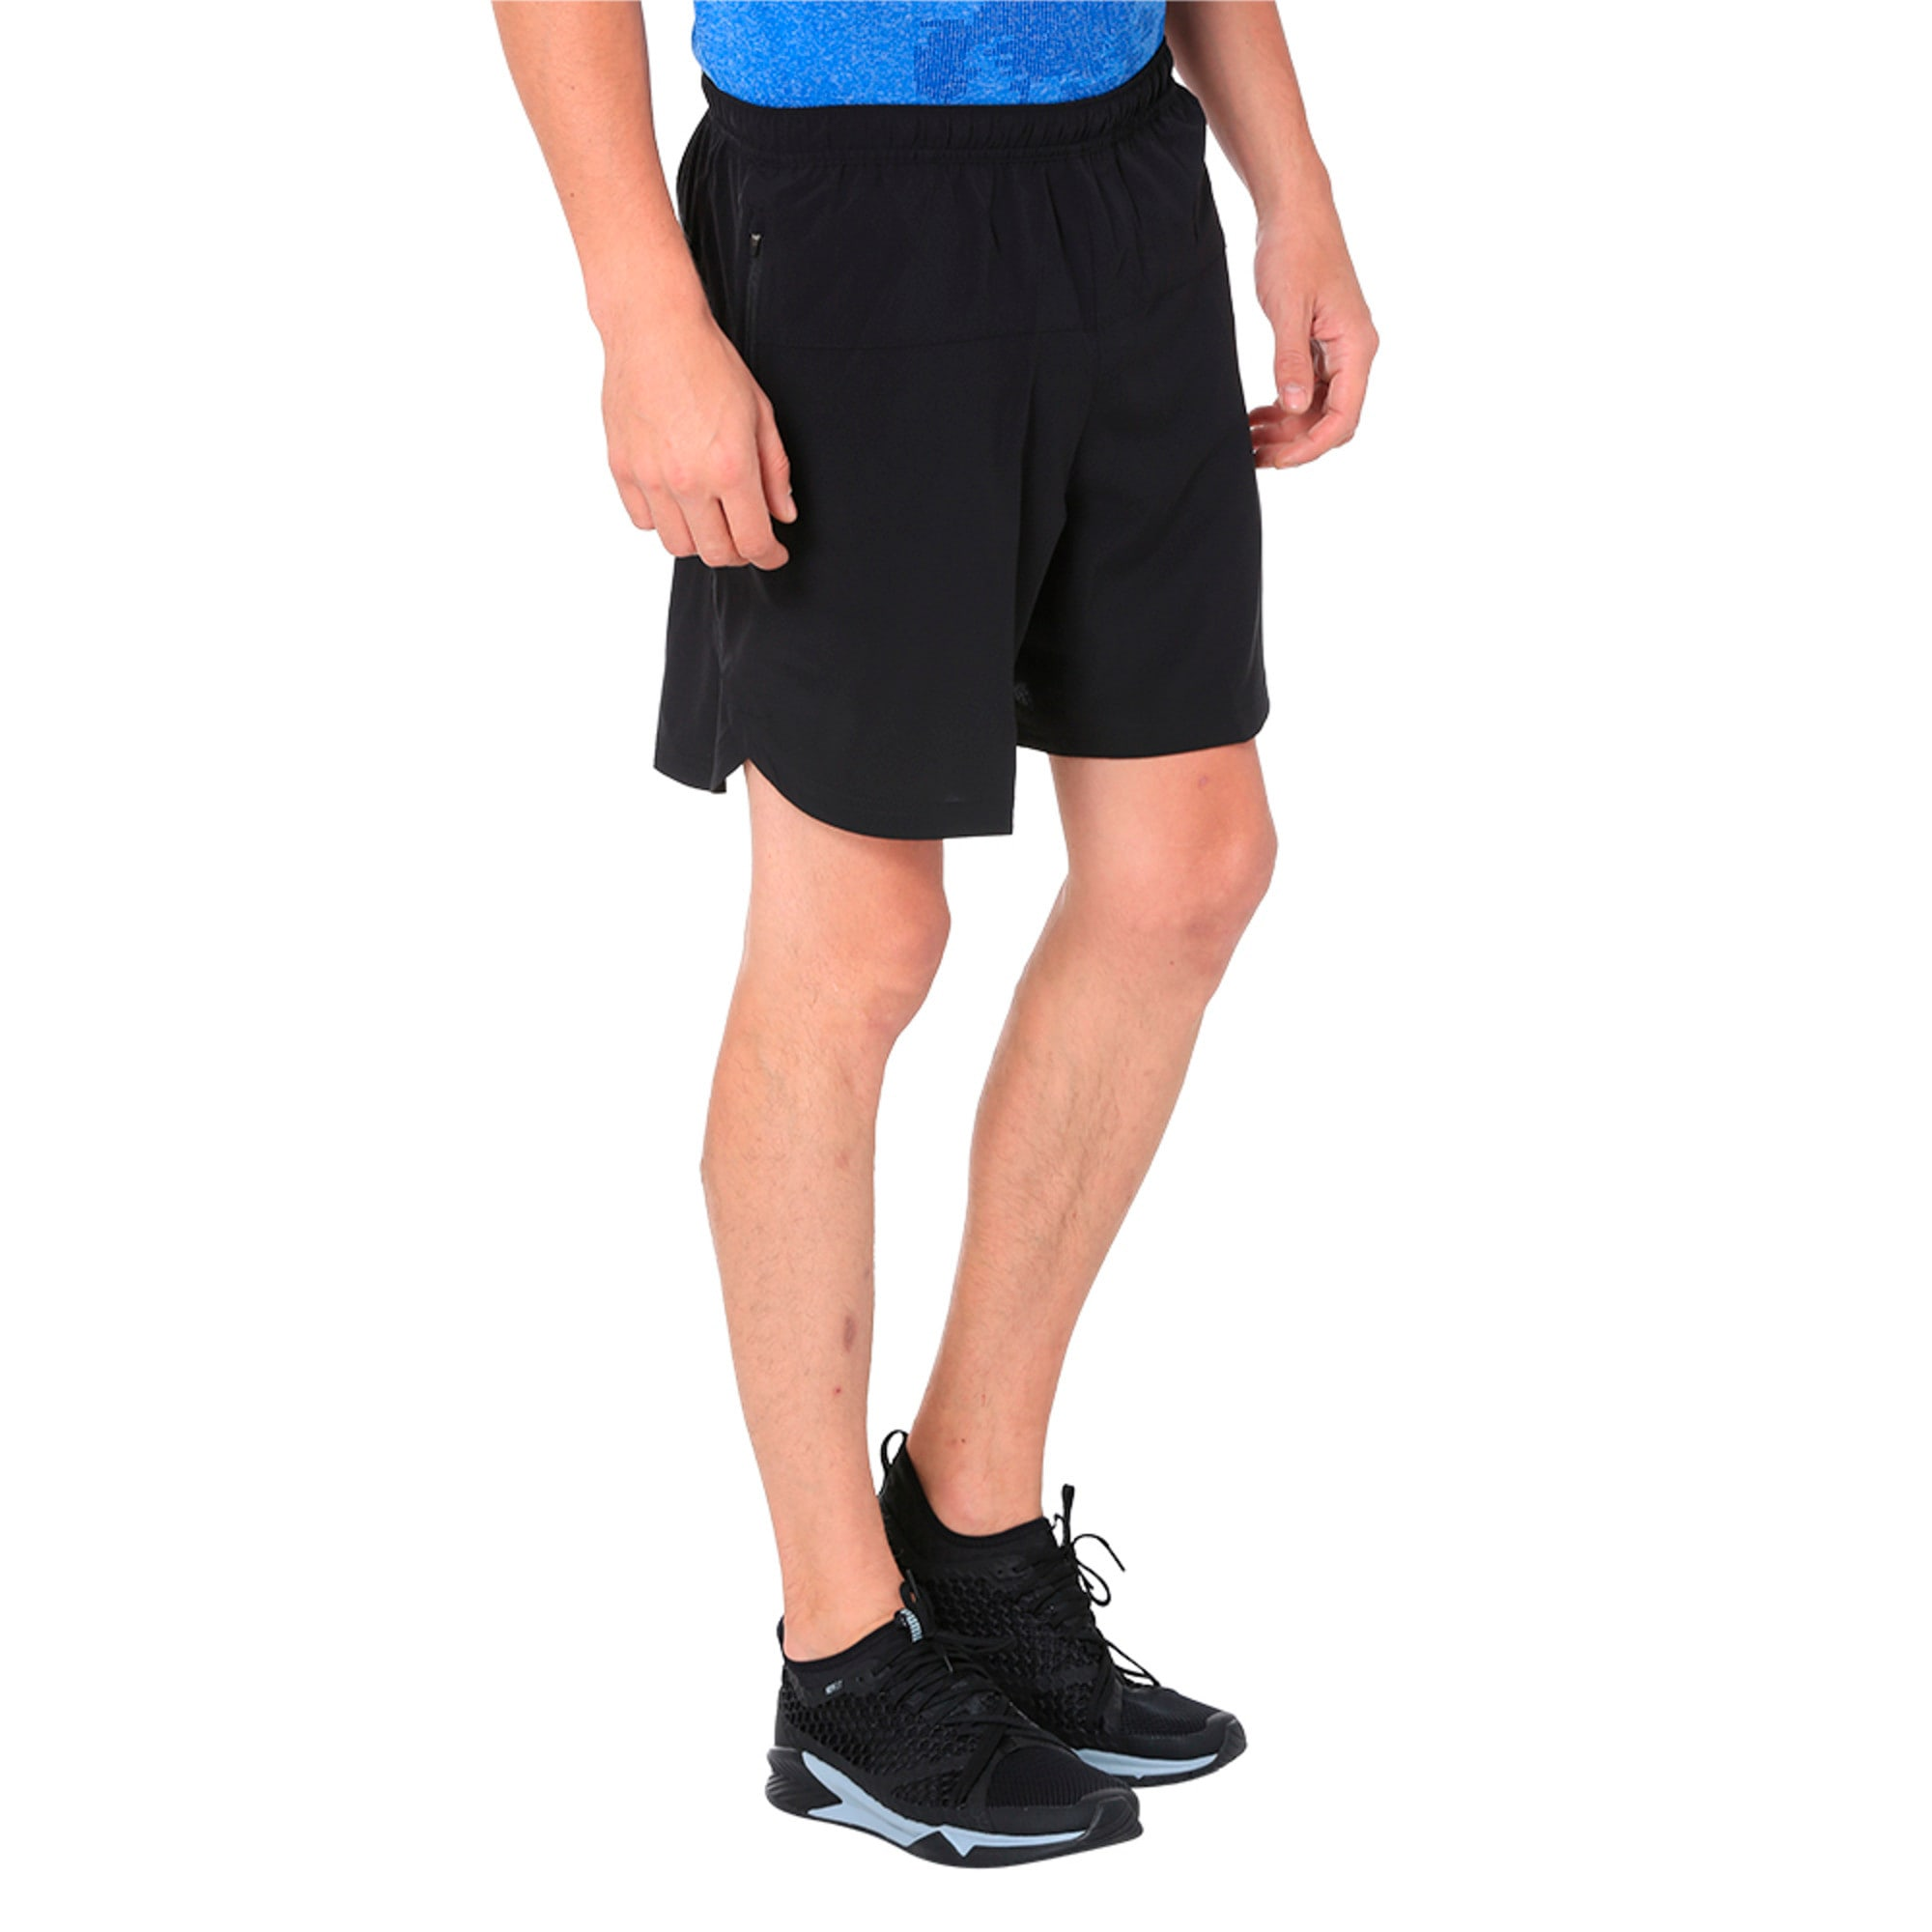 Thumbnail 2 of Pace 7'' Men's Running Shorts, Puma Black, medium-IND